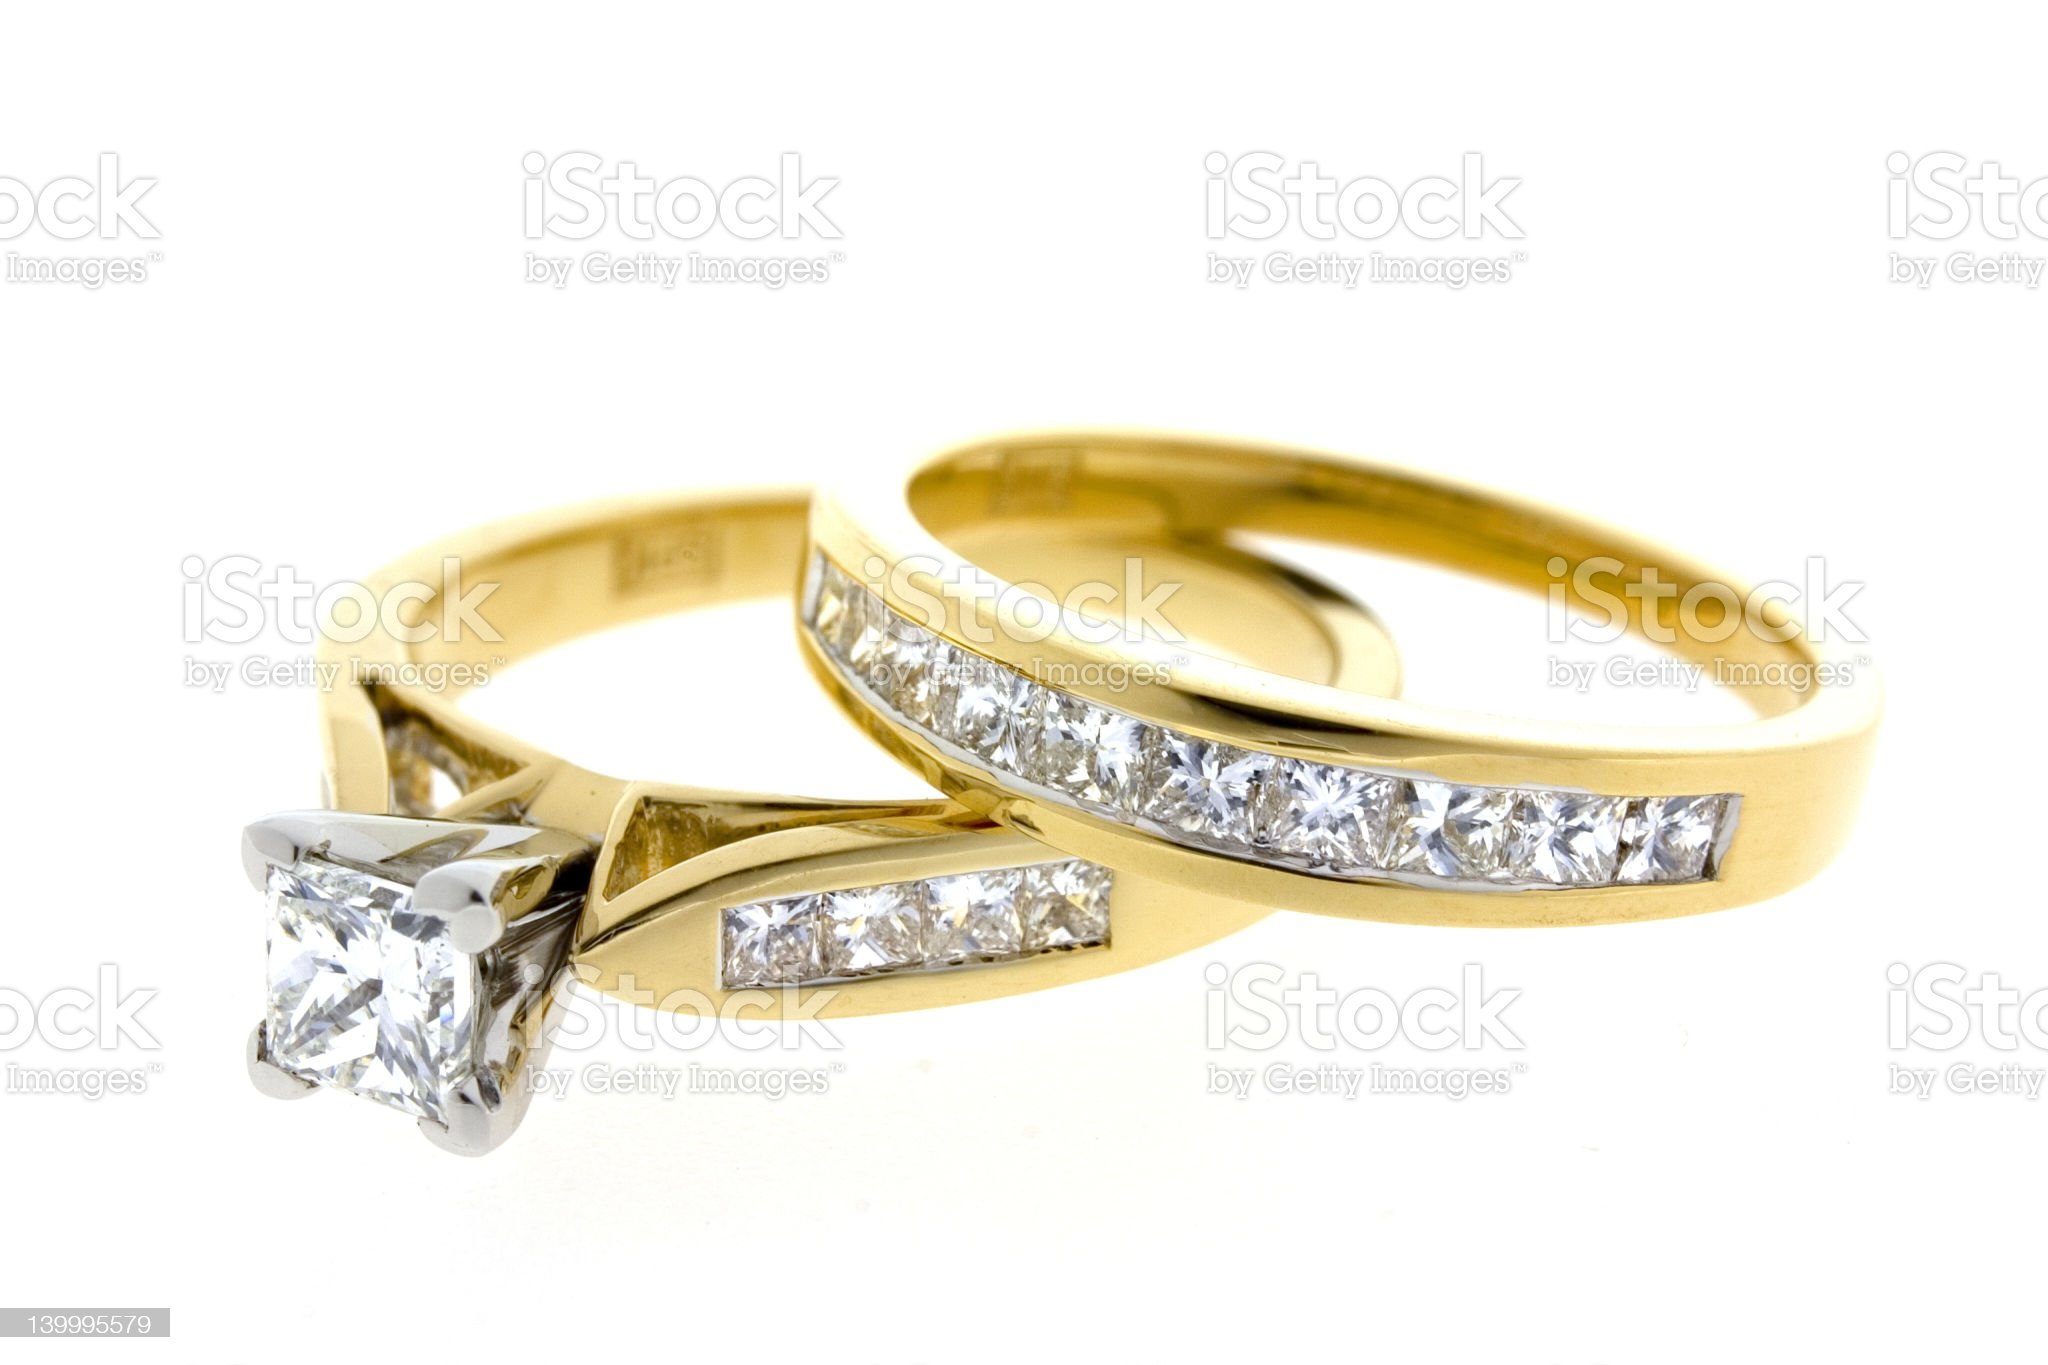 Diamond Engagement and wedding ring royalty-free stock photo